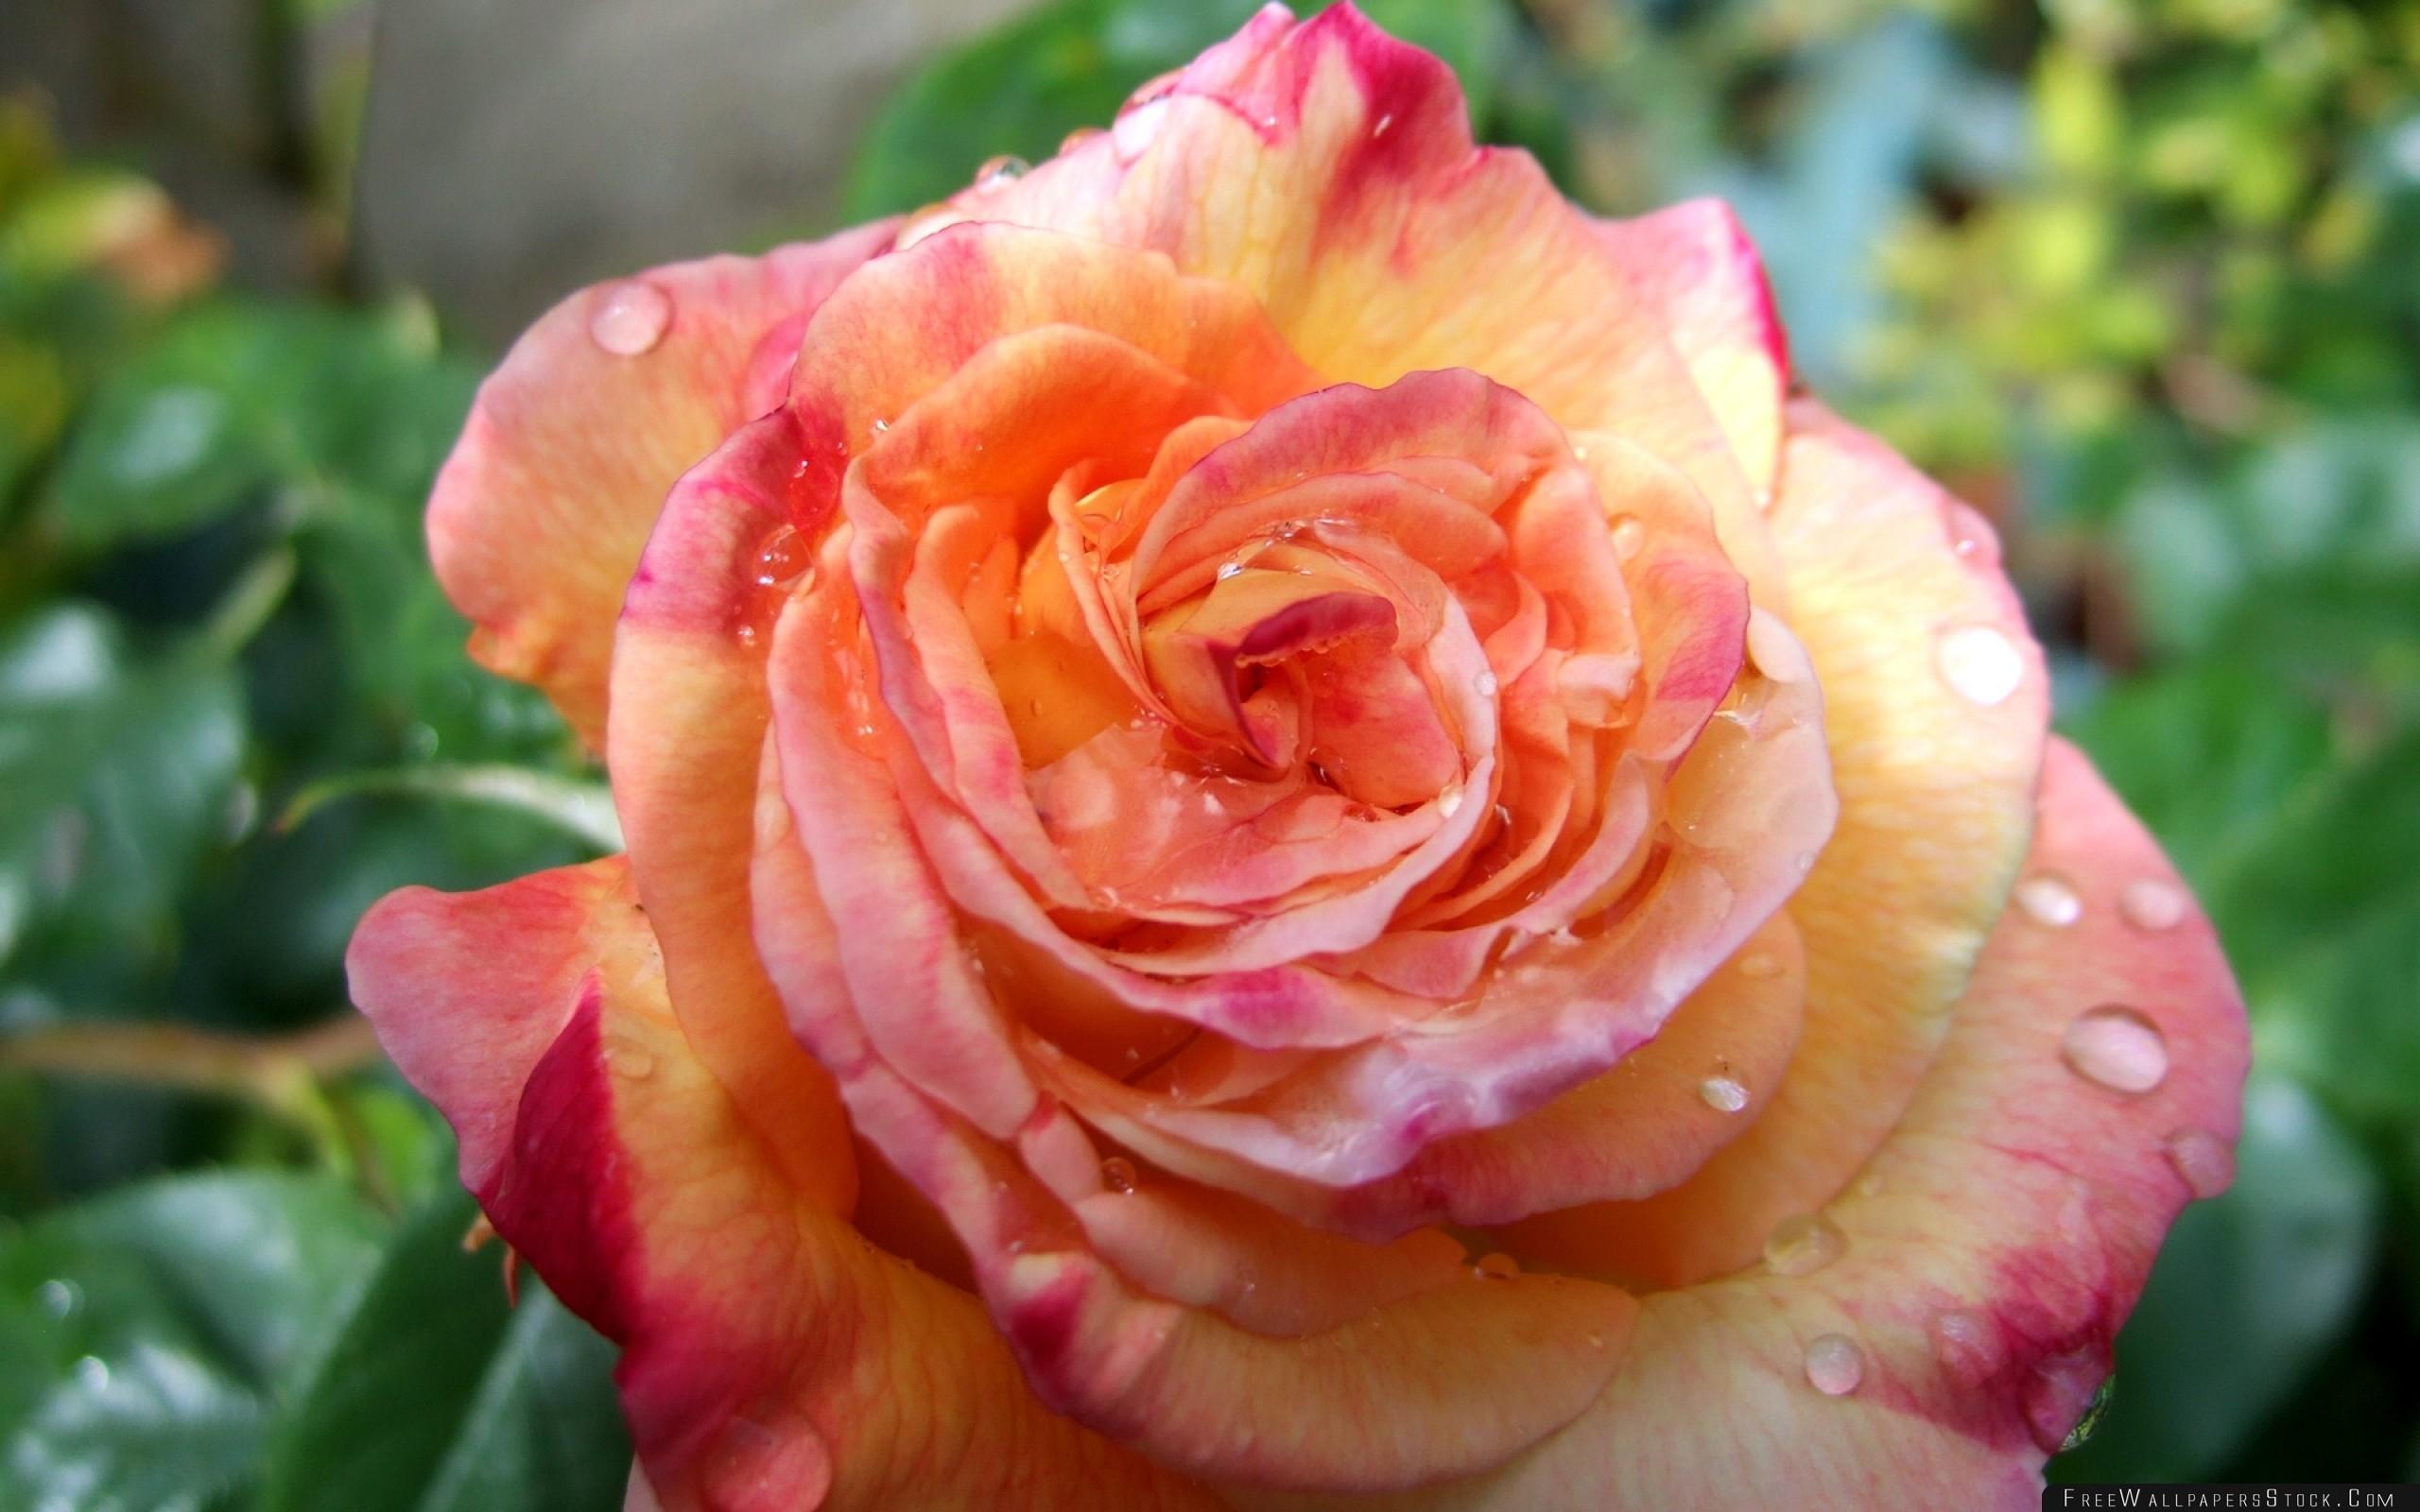 Download Free Wallpaper Rose Flower Bud Drop Freshness Close